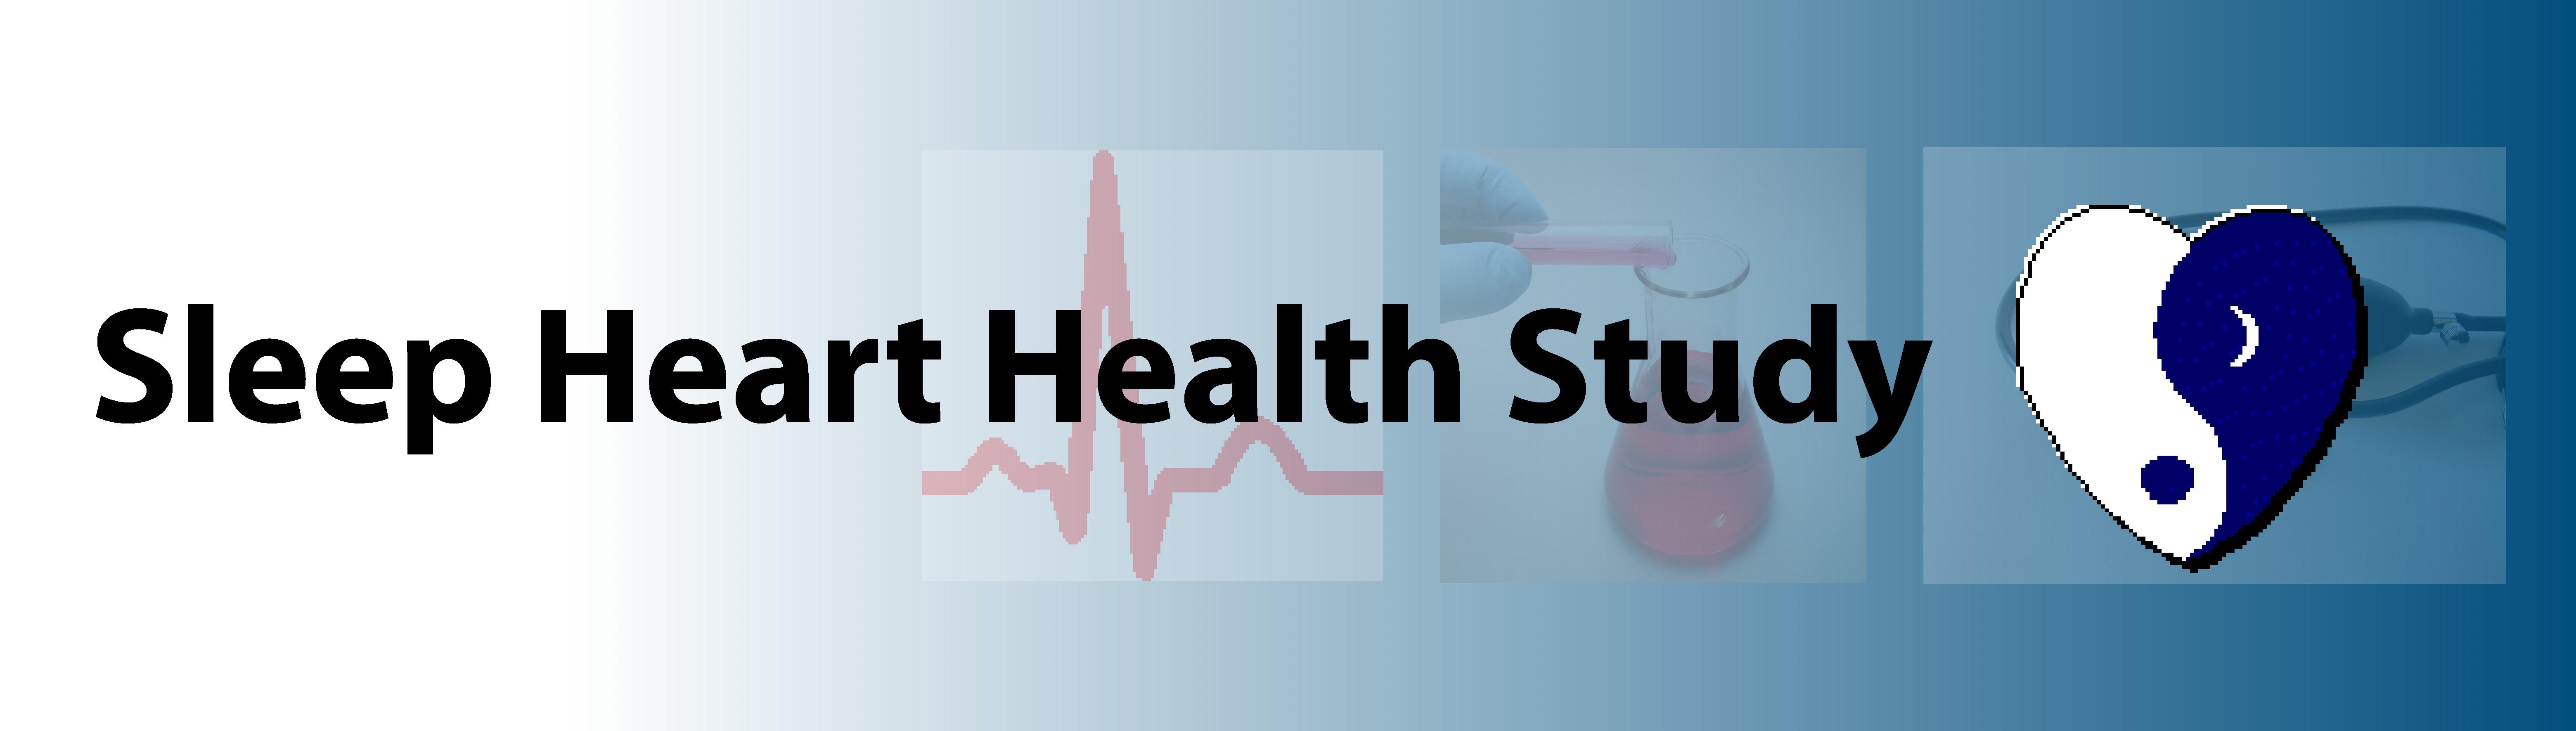 sleep health How sleep benefits your heart, weight, mind, and more.